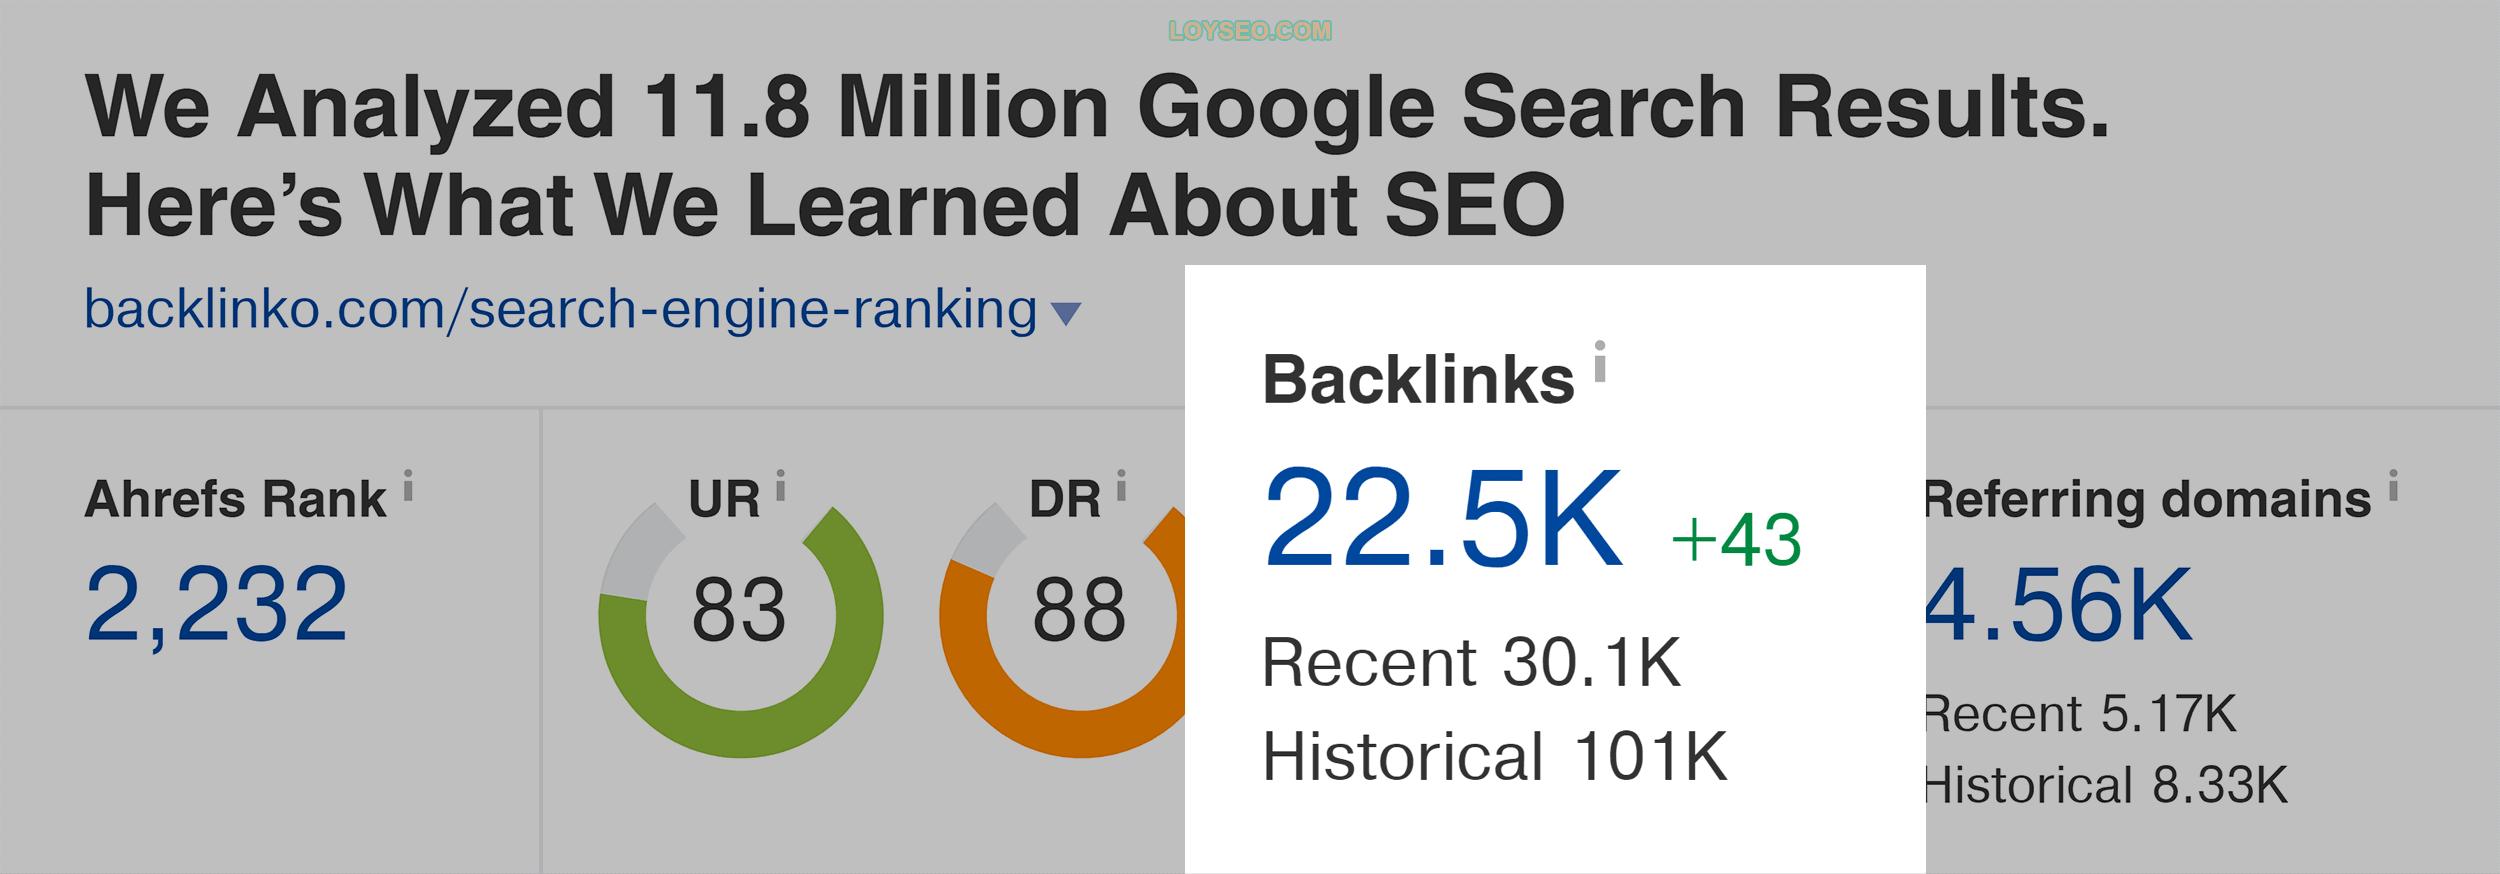 Ahrefs – Search engine ranking – Backlinks